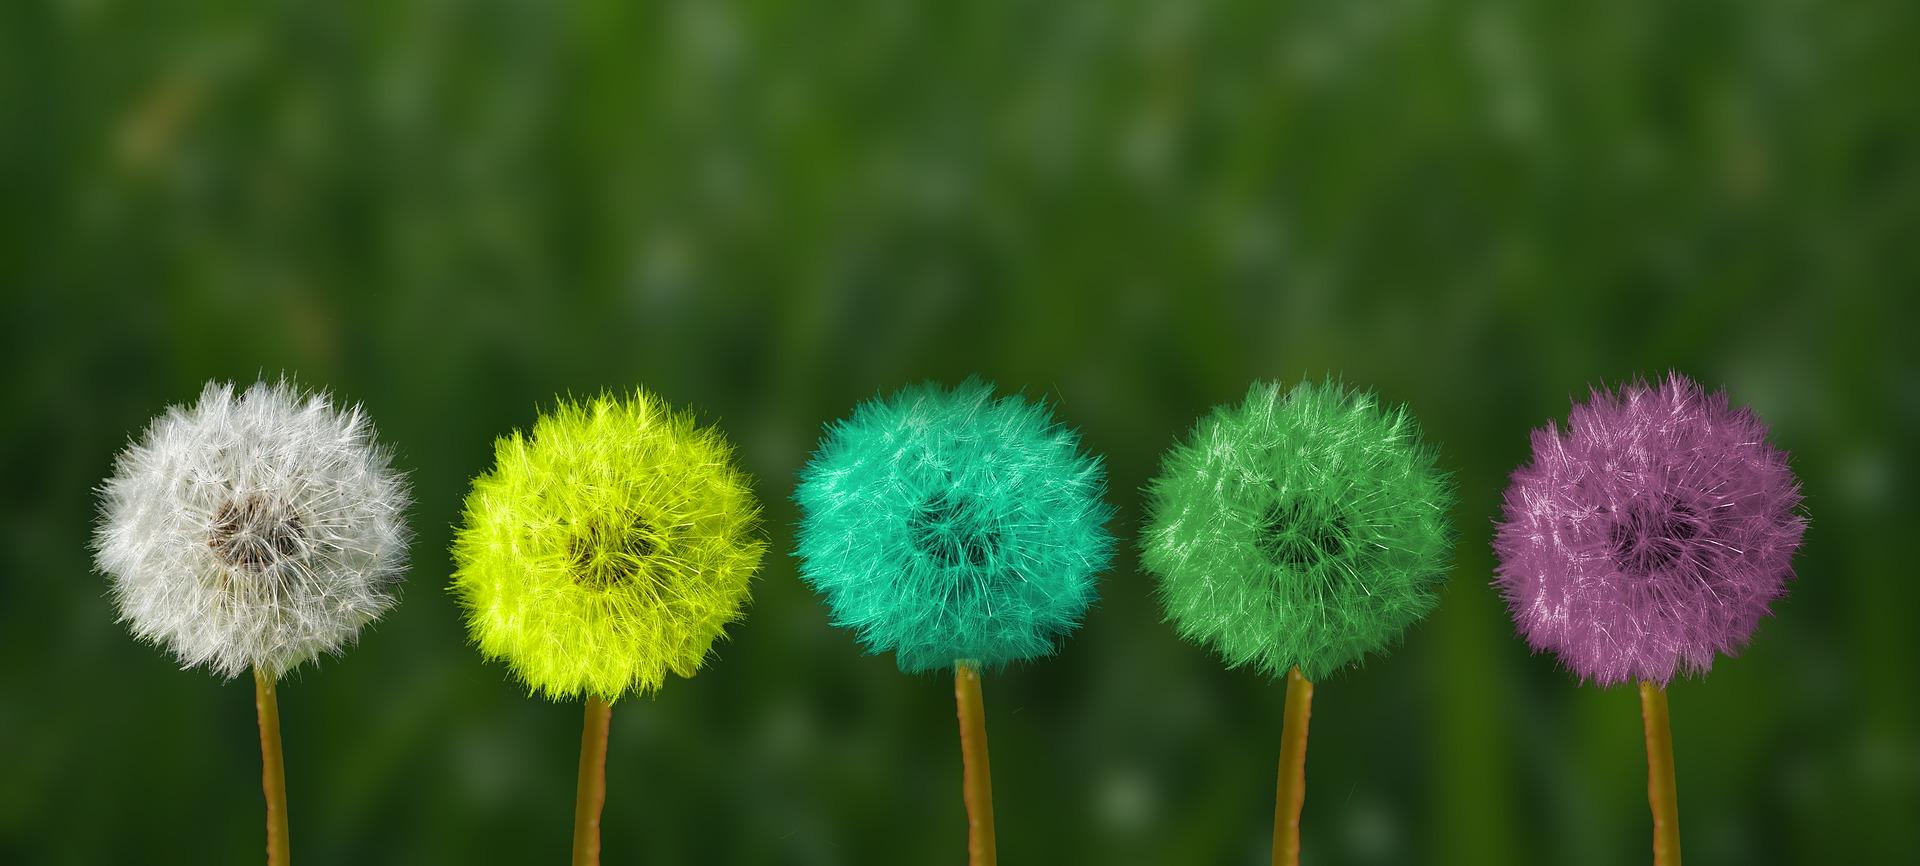 Pusteblumen in verschiedenen Farben